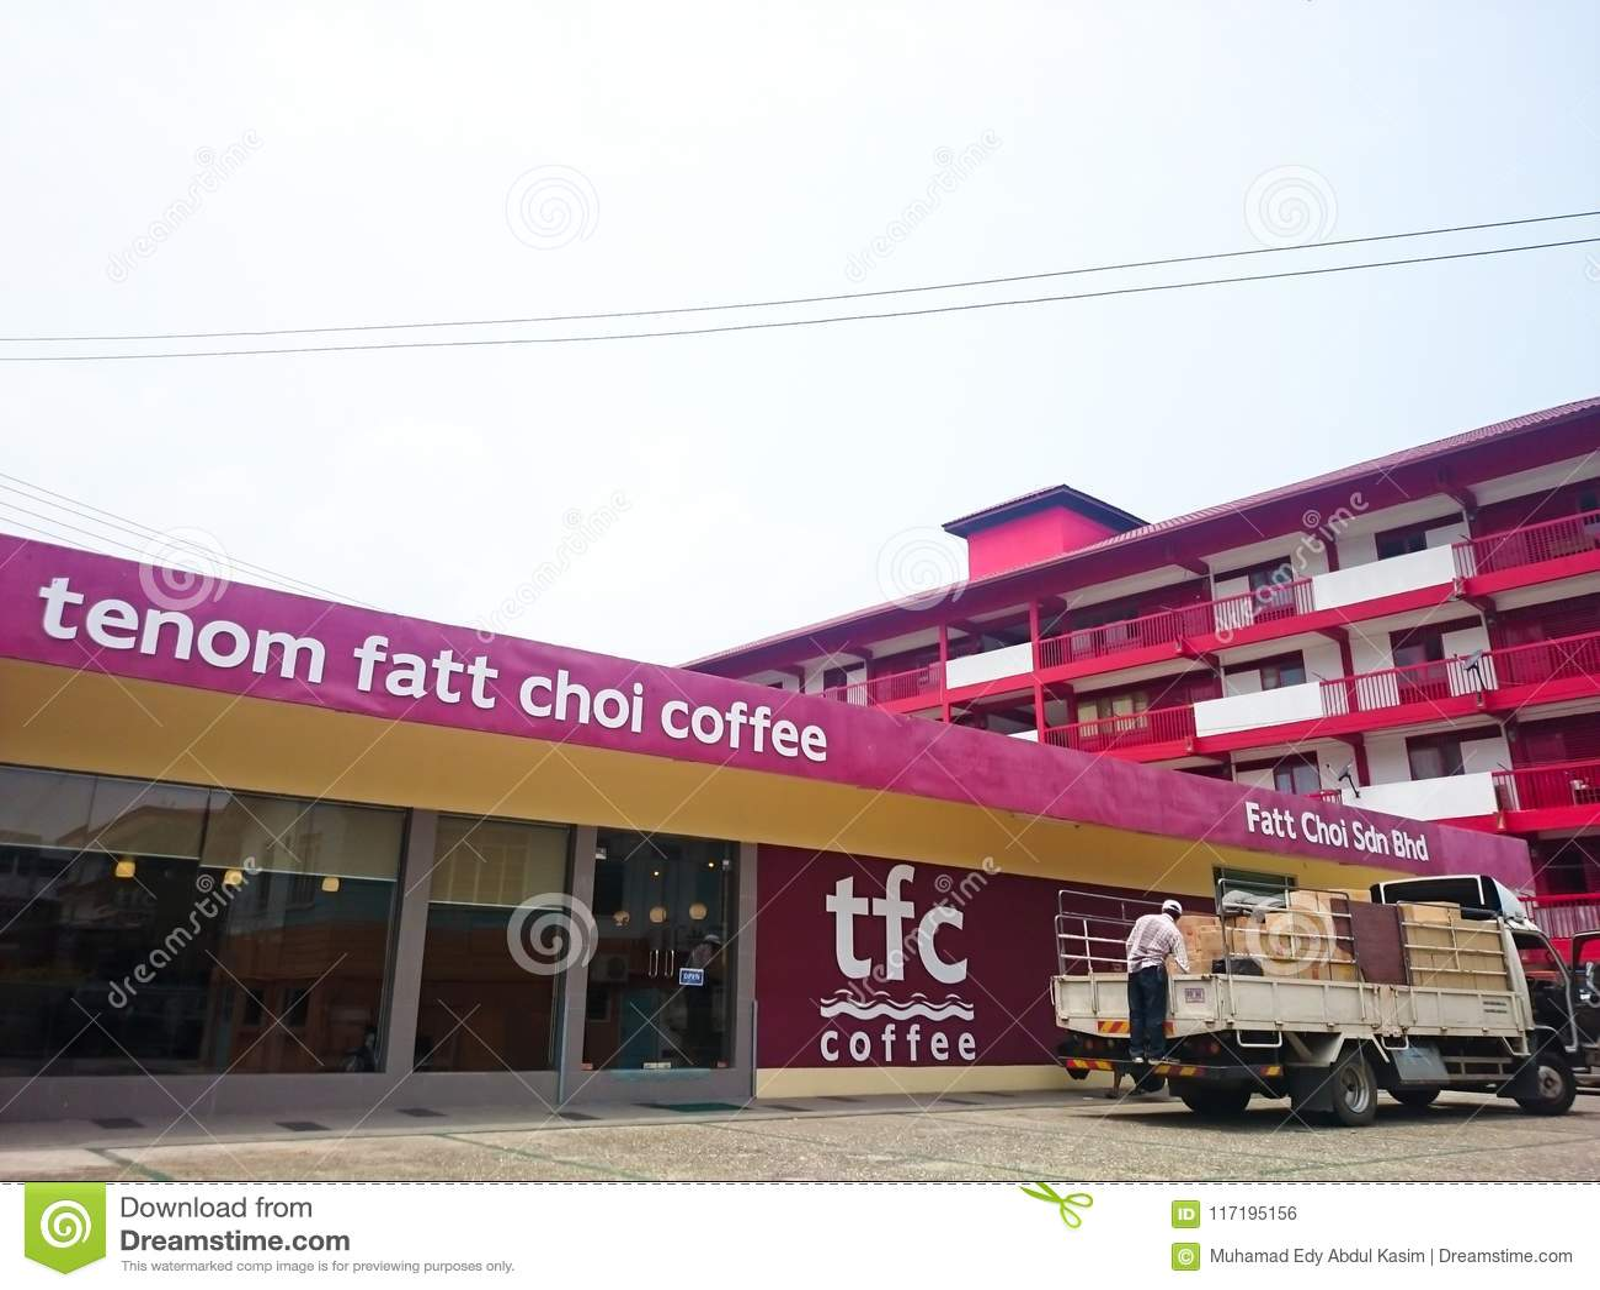 Tenom Fatt Choi Coffee Factory